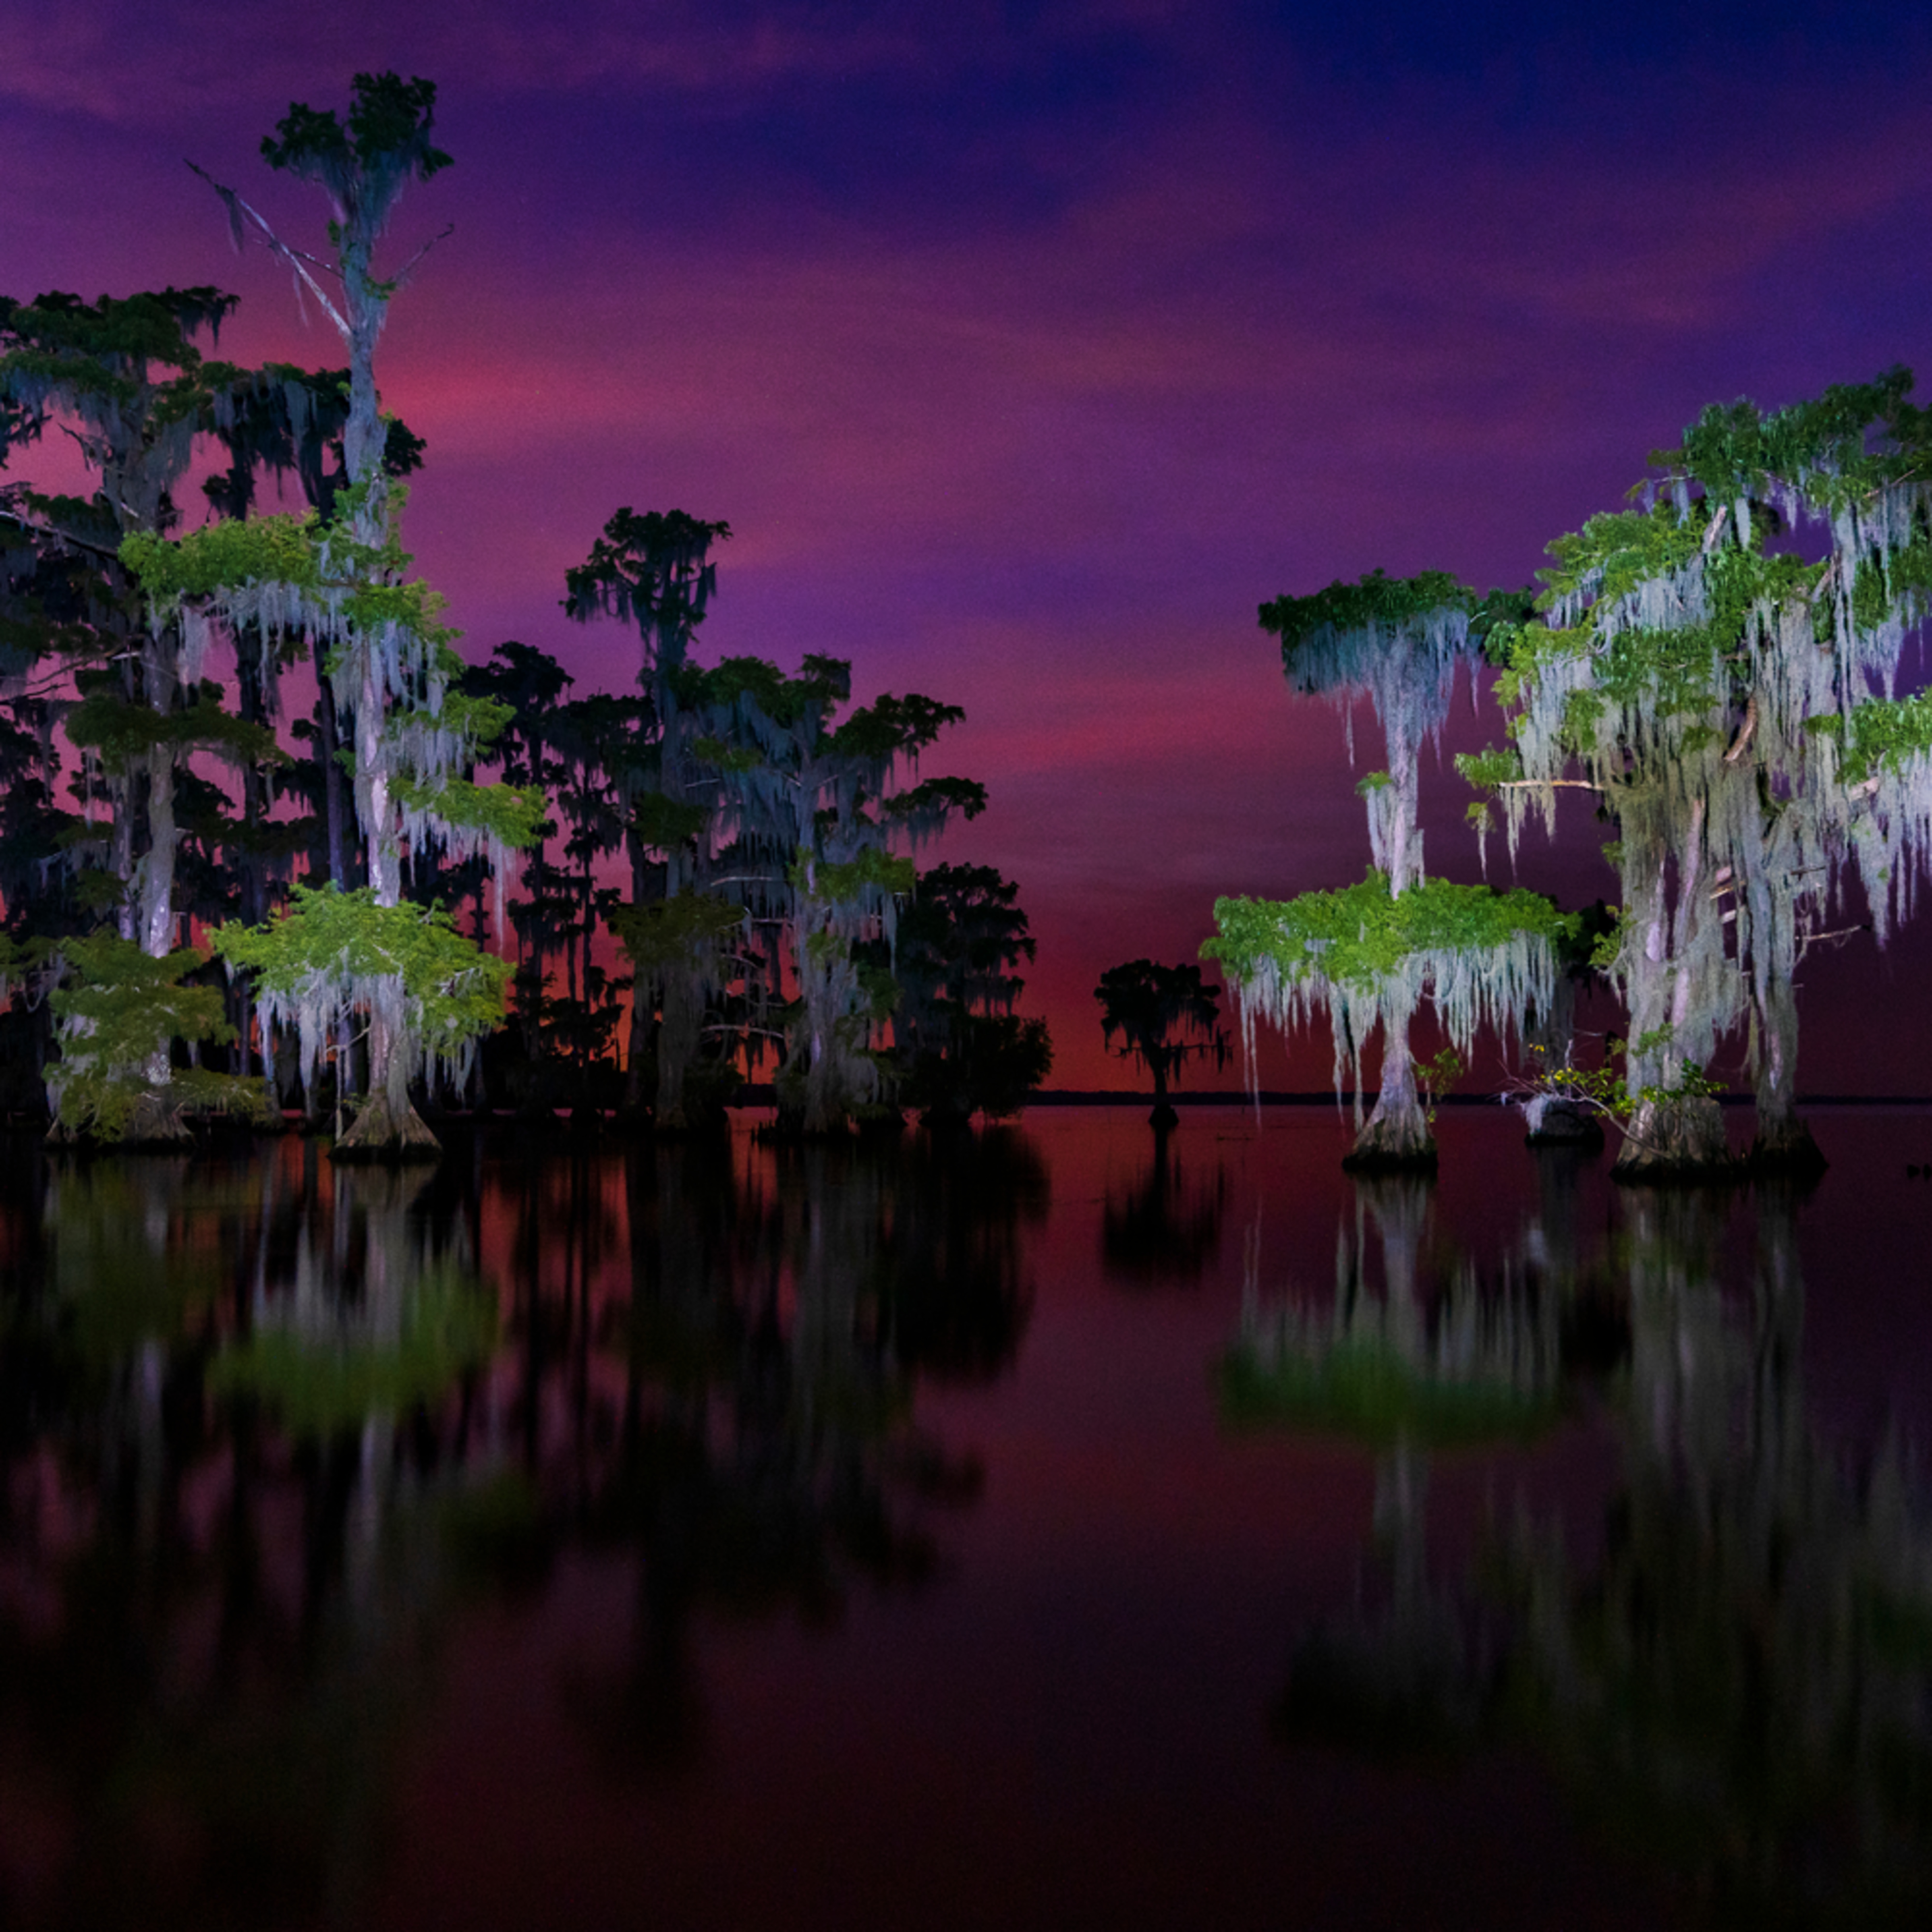 Andy crawford photography lake maurepas 005 vdzzff